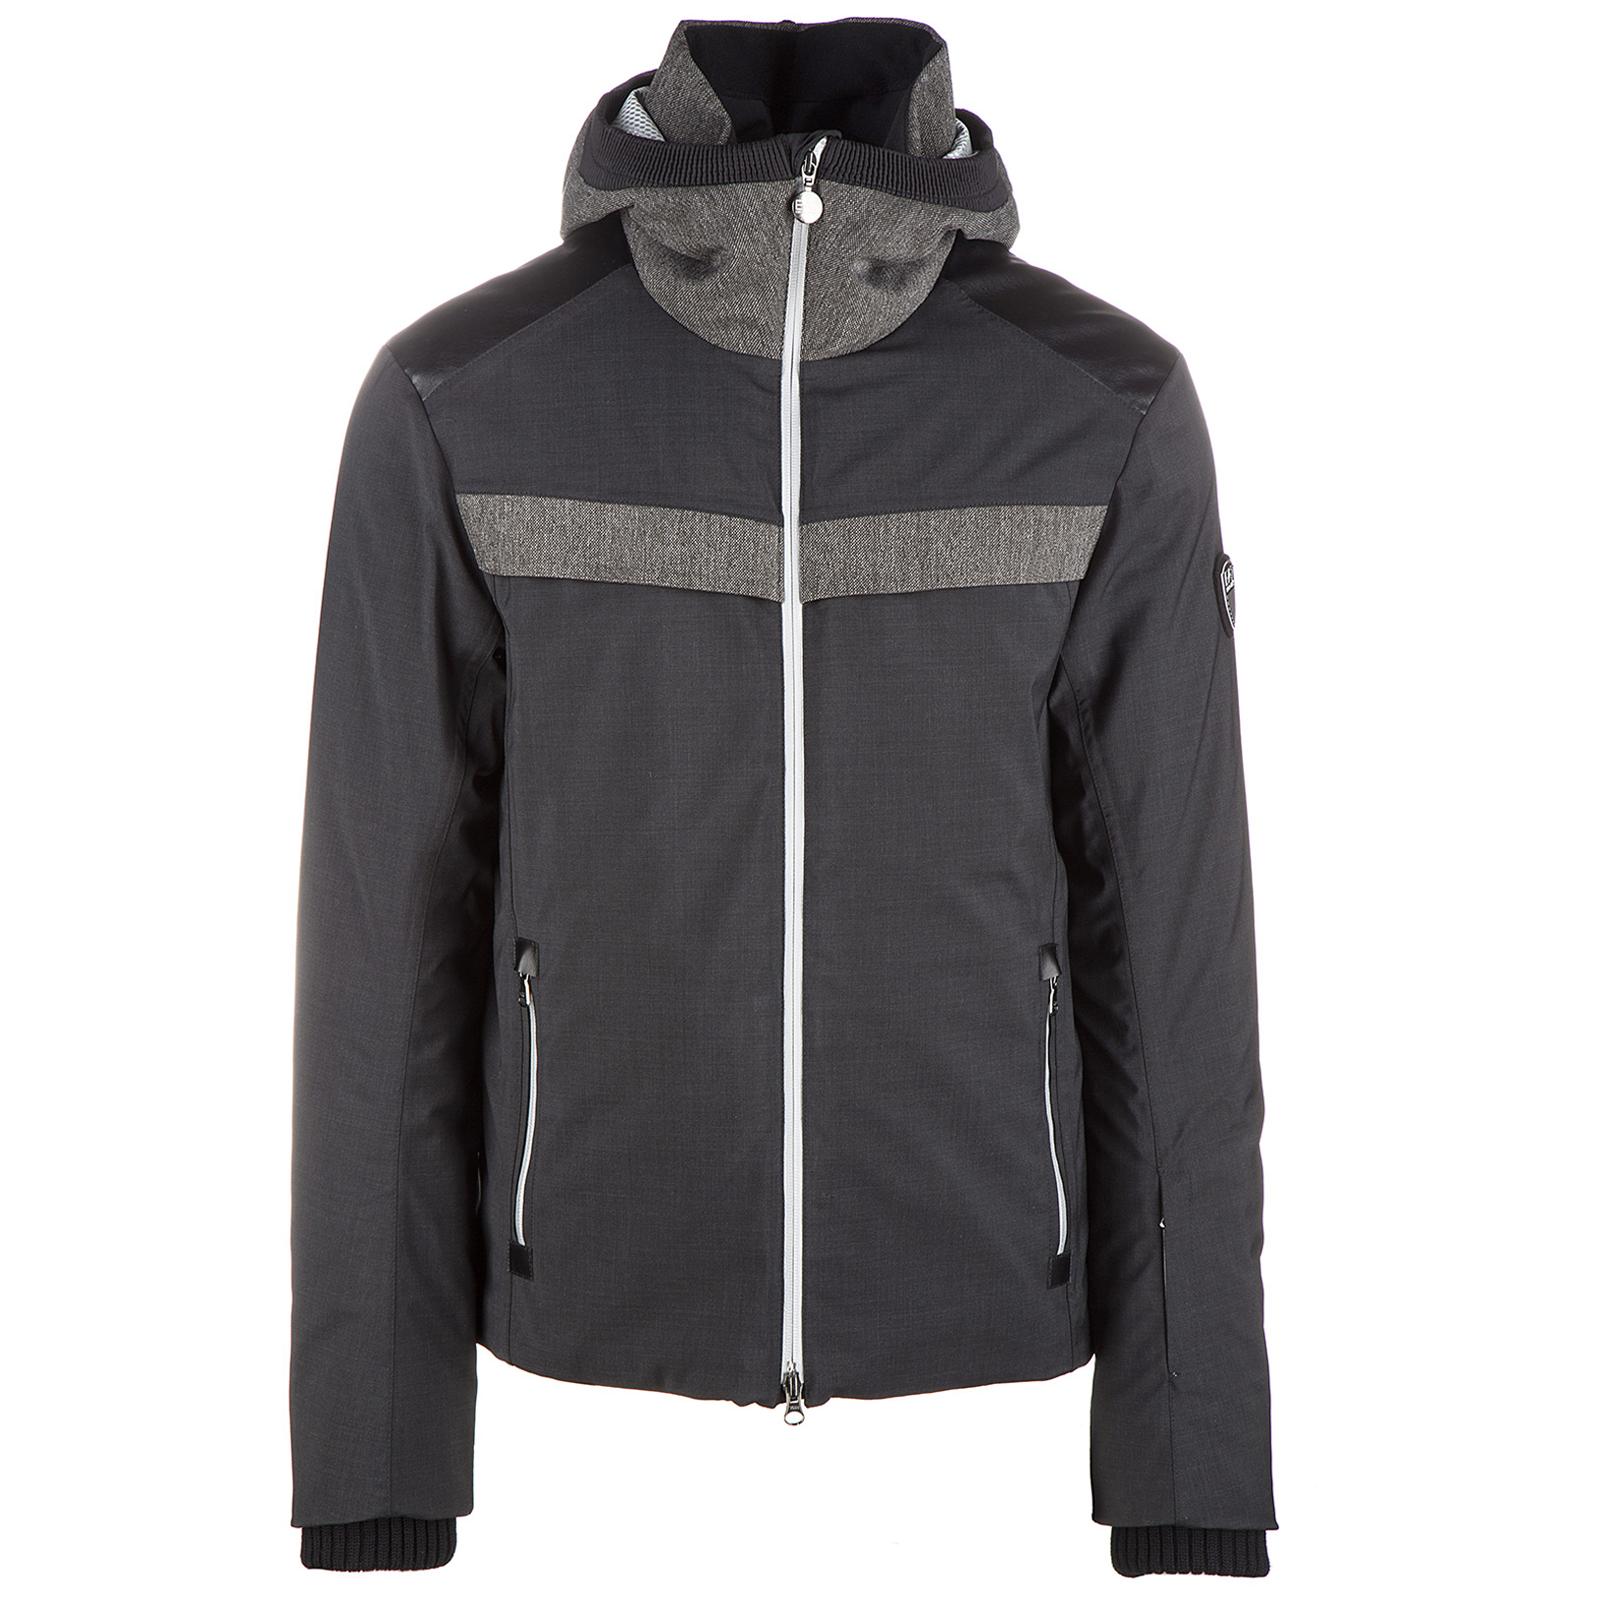 Men's ski jacket winter